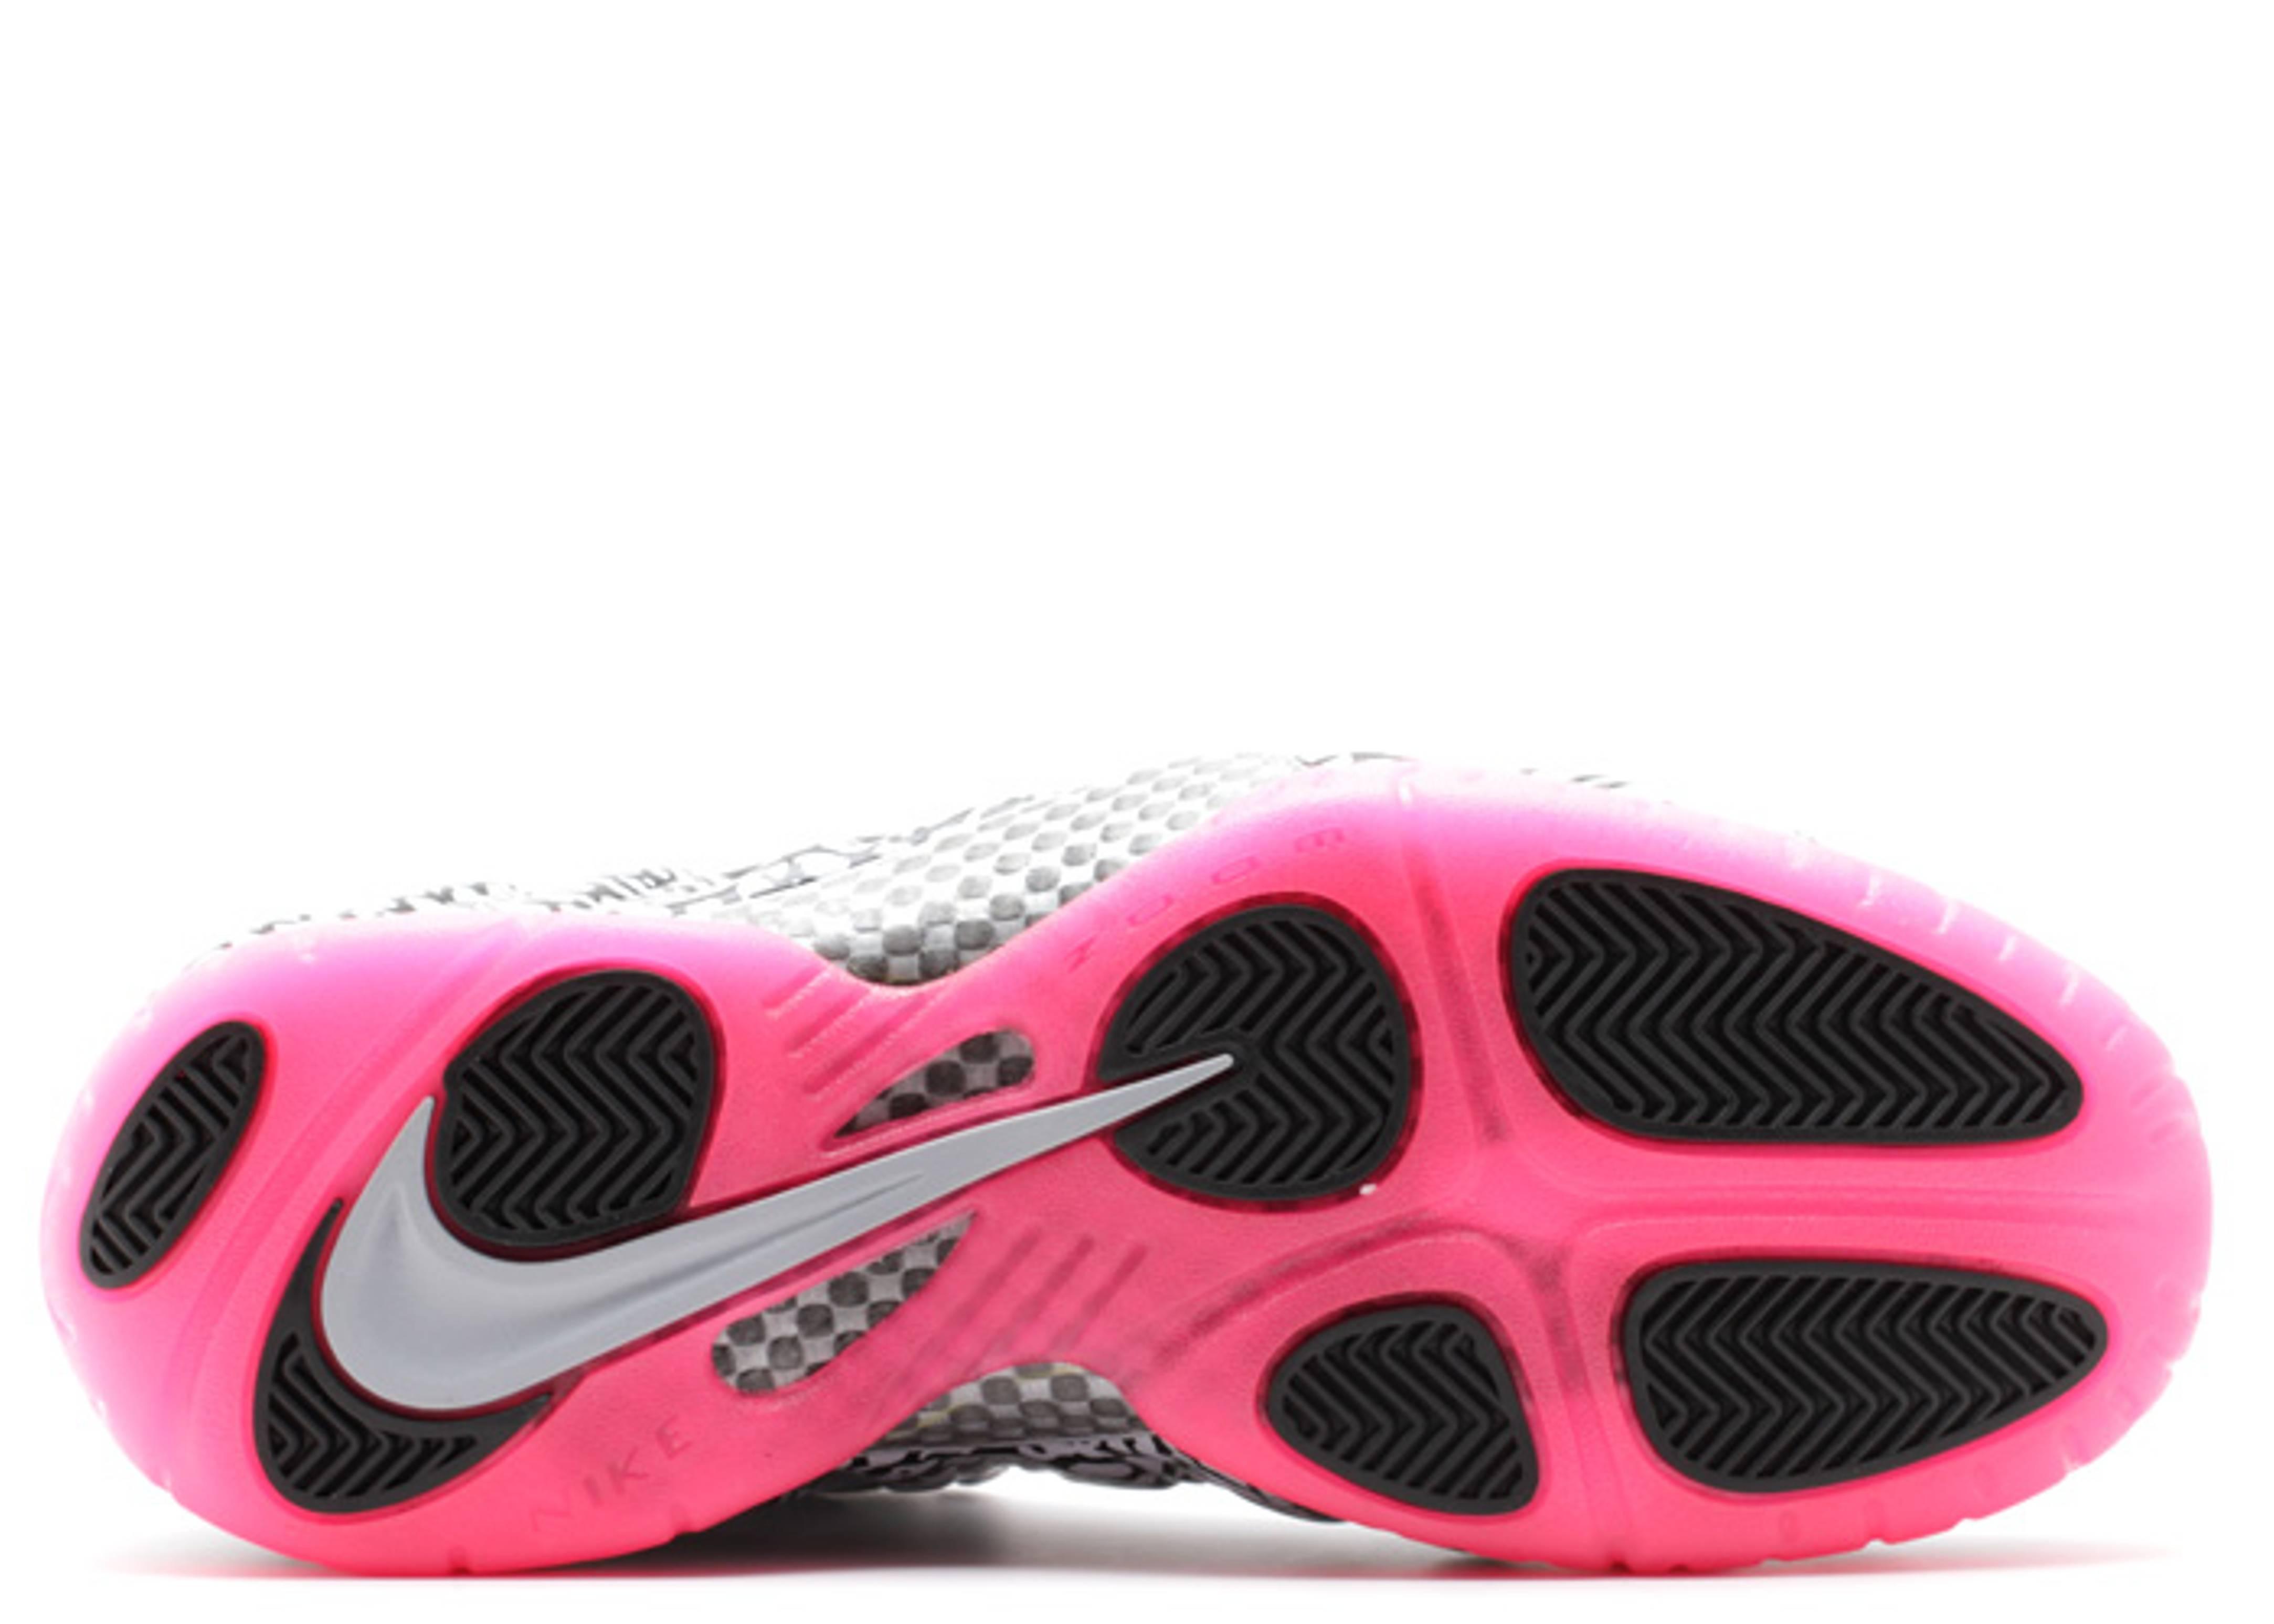 promo code 87908 06b8b ... nike air foamposite pro prm elephant print hyper rosa . ...